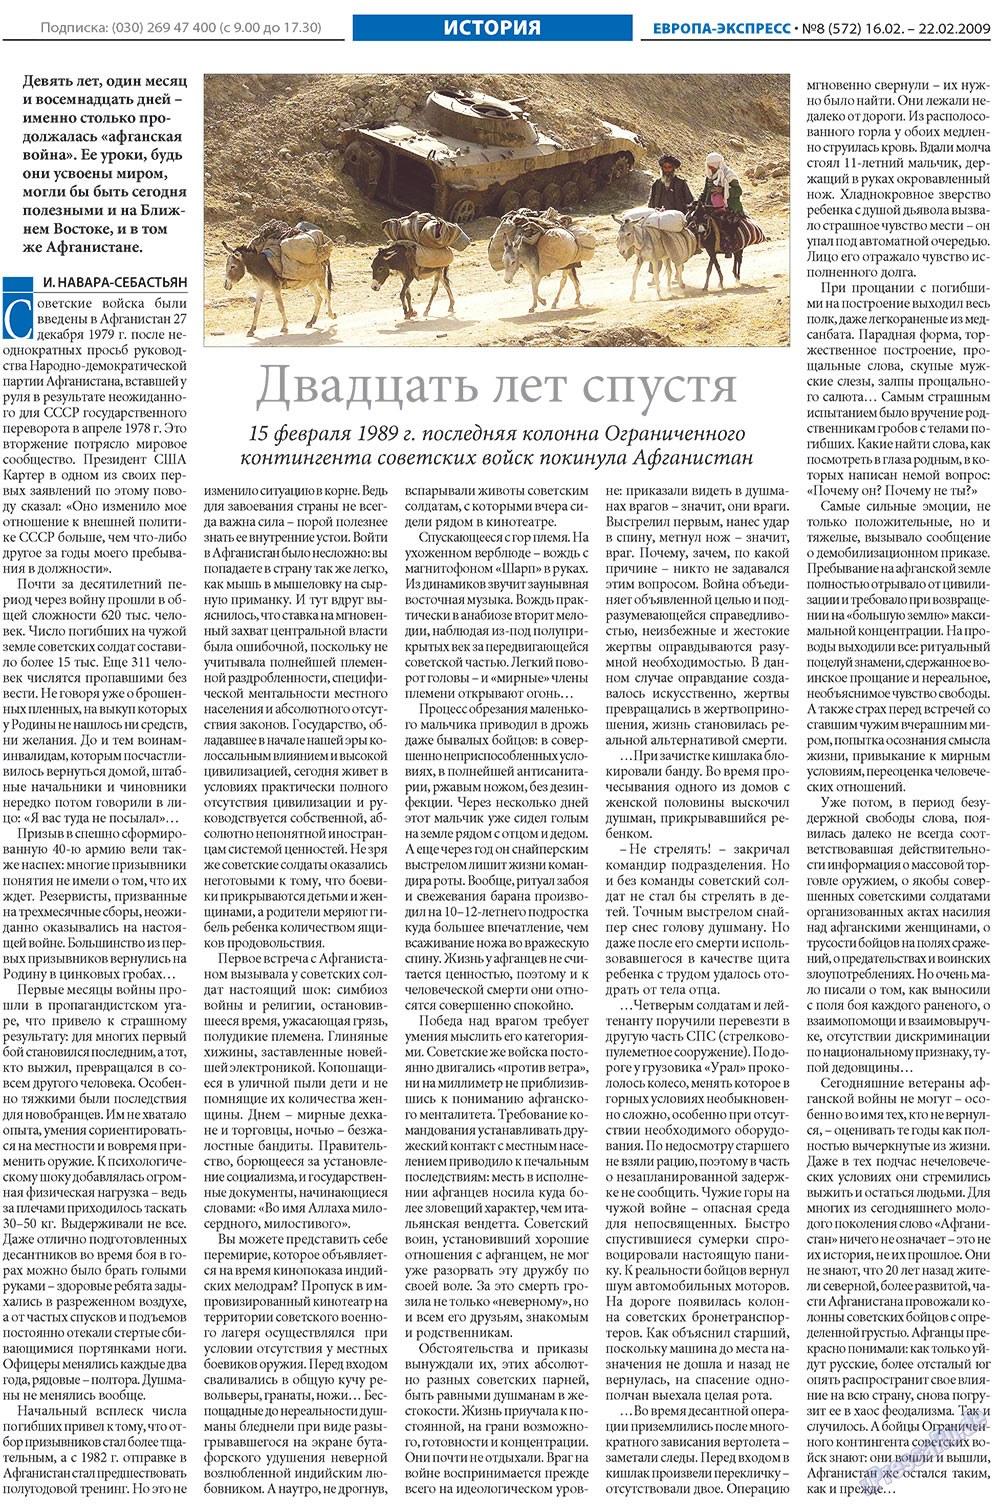 Европа экспресс (газета). 2009 год, номер 8, стр. 15